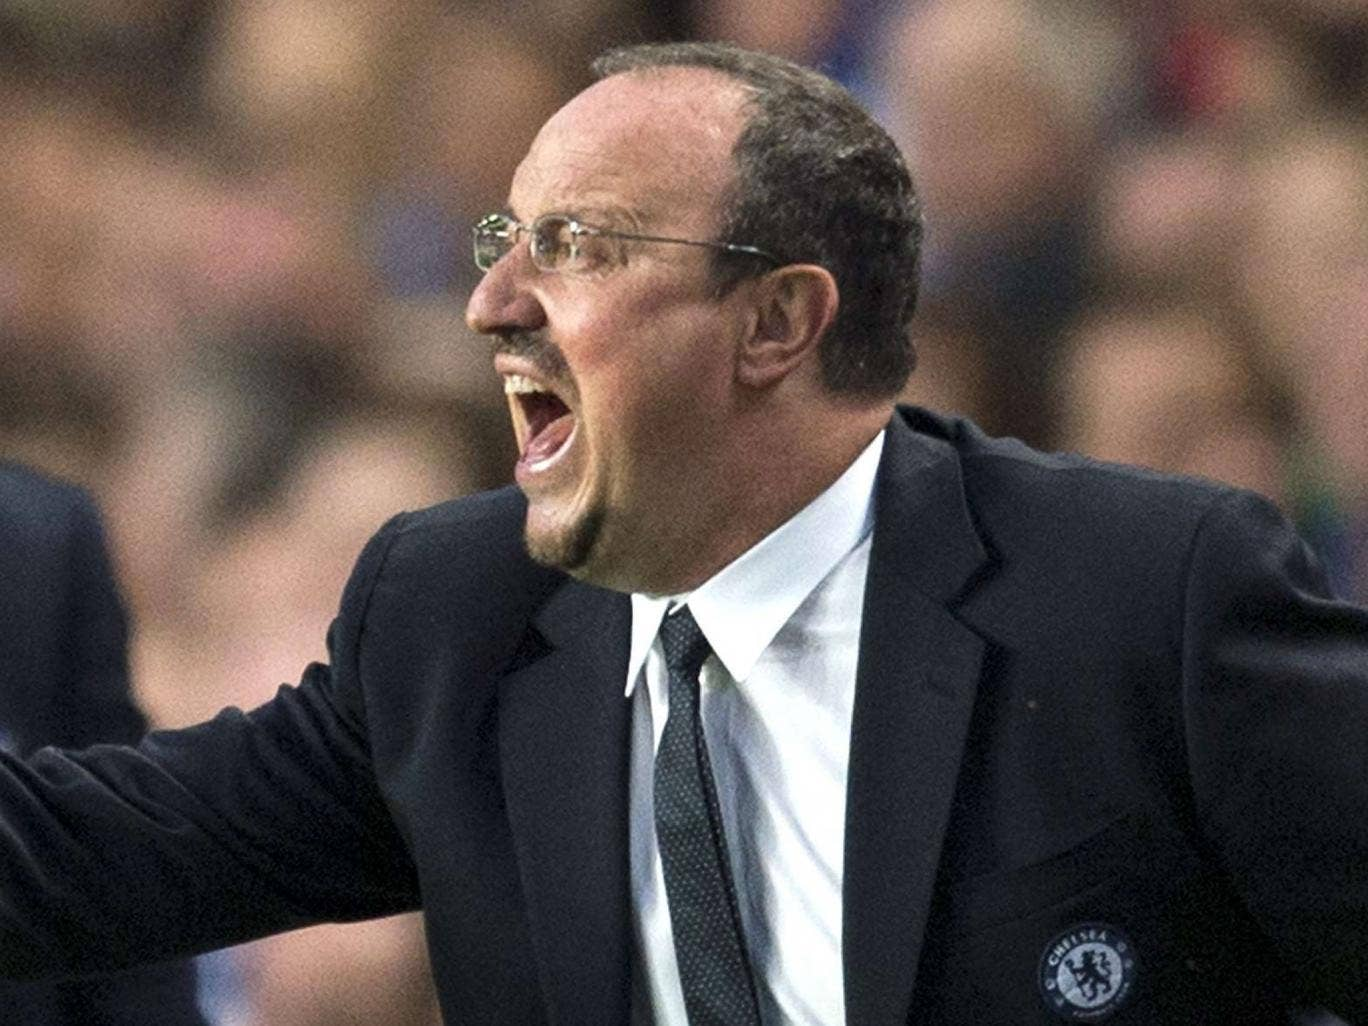 Chelsea manager Rafael Benitez has taken Chelsea to the final